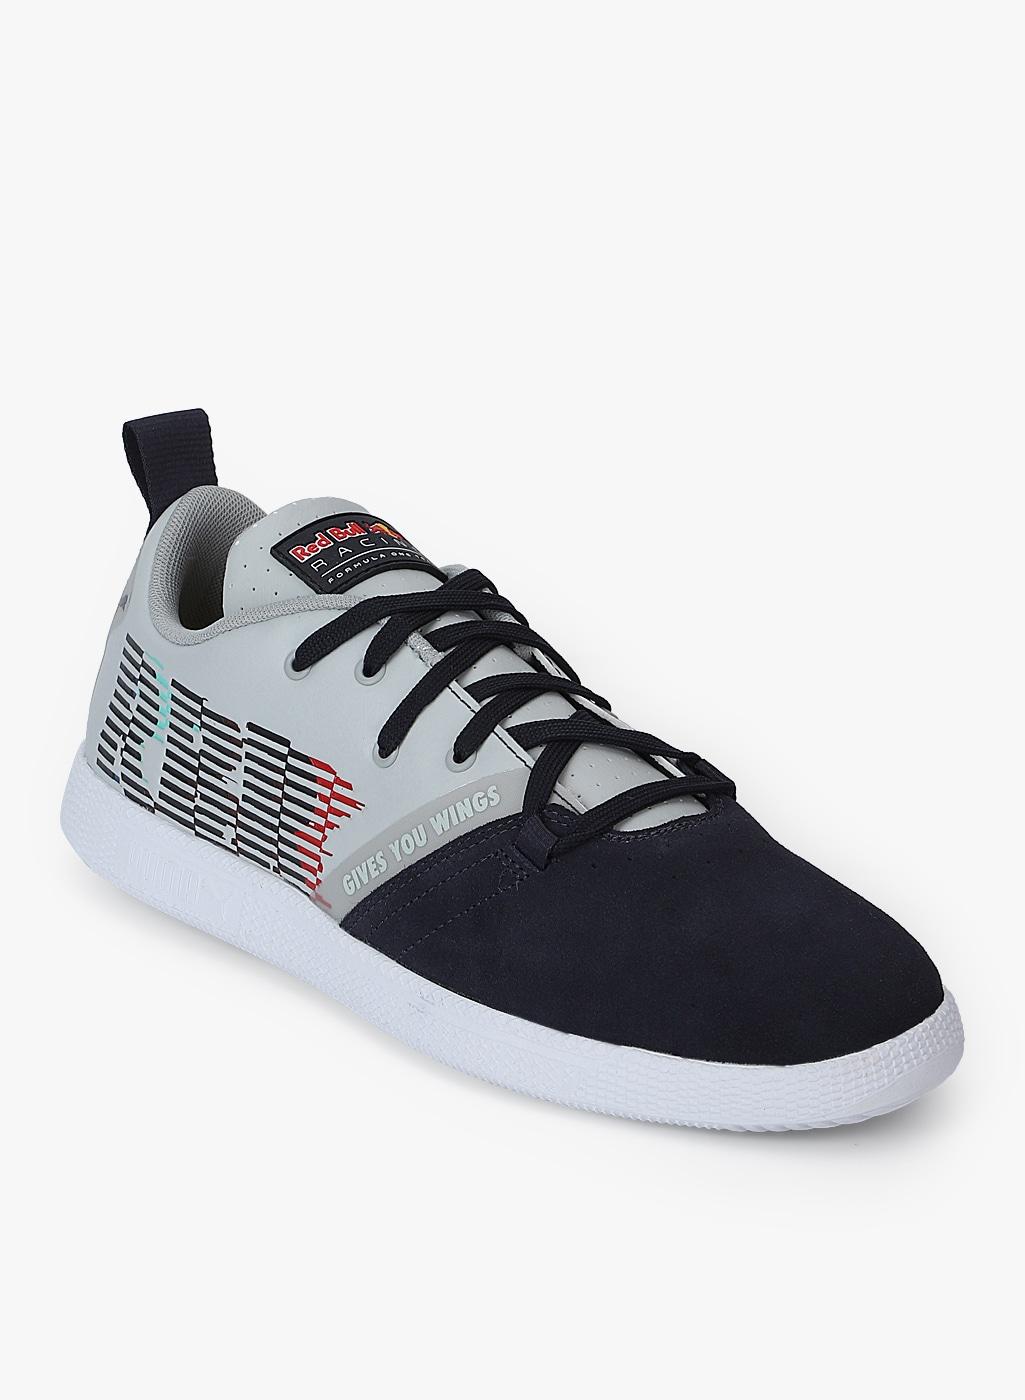 0f1e9423c08f0c Navy Blue Blue Coffee Shoes Puma - Buy Navy Blue Blue Coffee Shoes Puma  online in India - Jabong